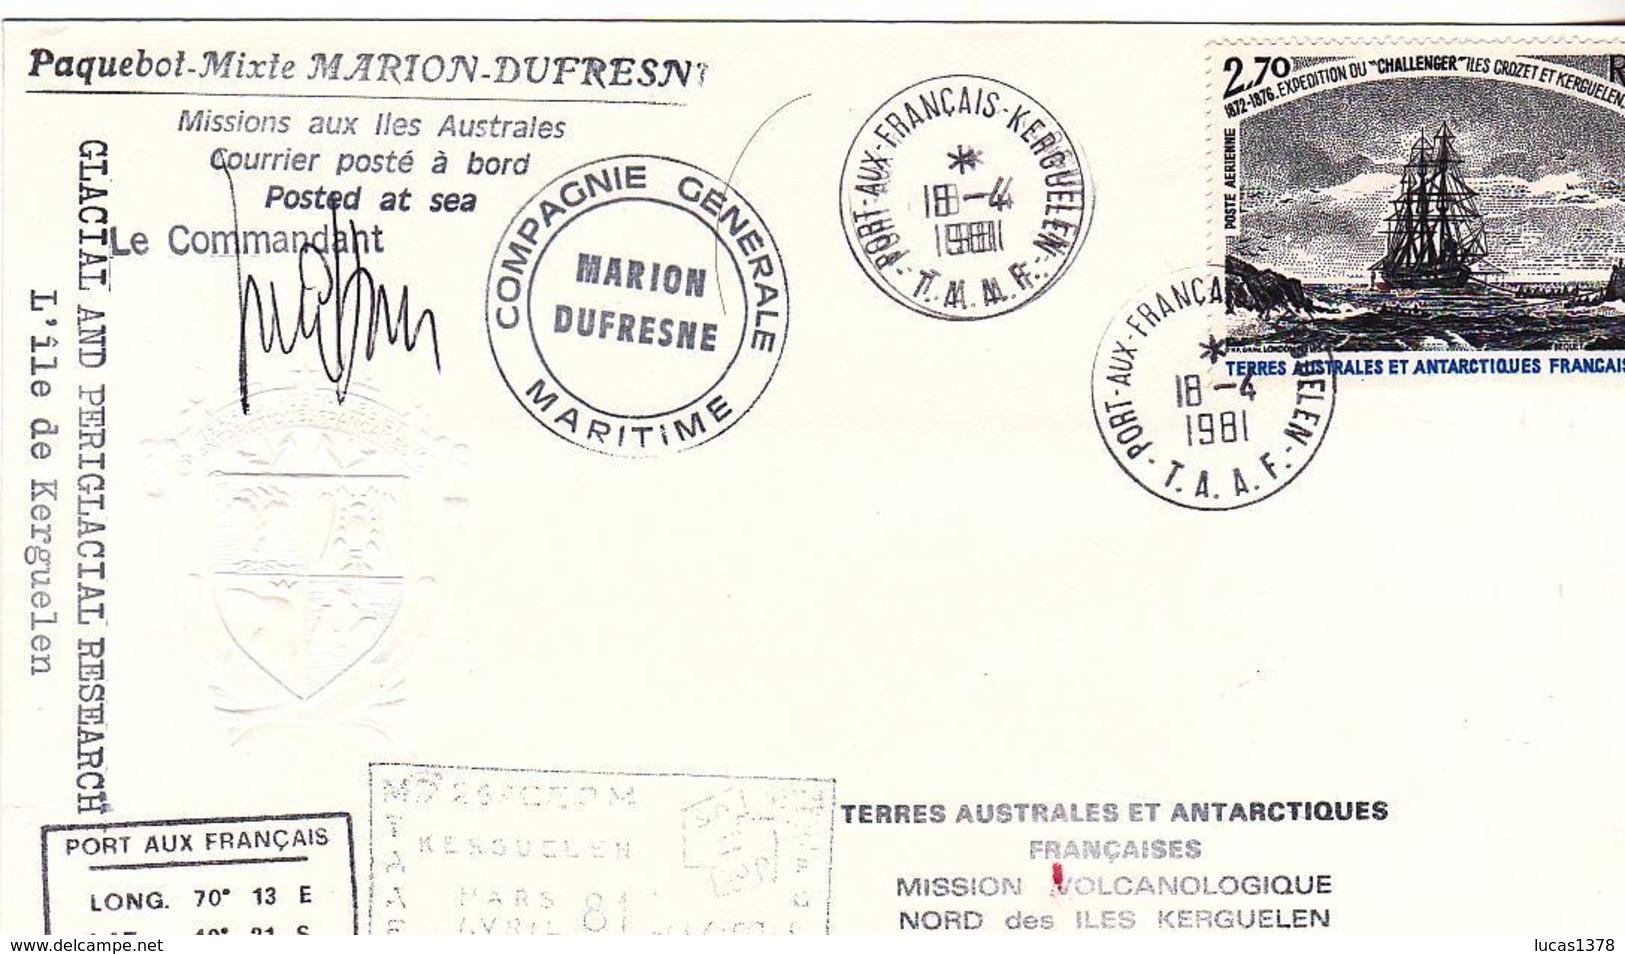 TAAF / PAQUEBOT MIXTE MARION DUFRESNE / MISSION VOLCANOLOGIQUE NORD KERGUELEN / N 53 - Terres Australes Et Antarctiques Françaises (TAAF)